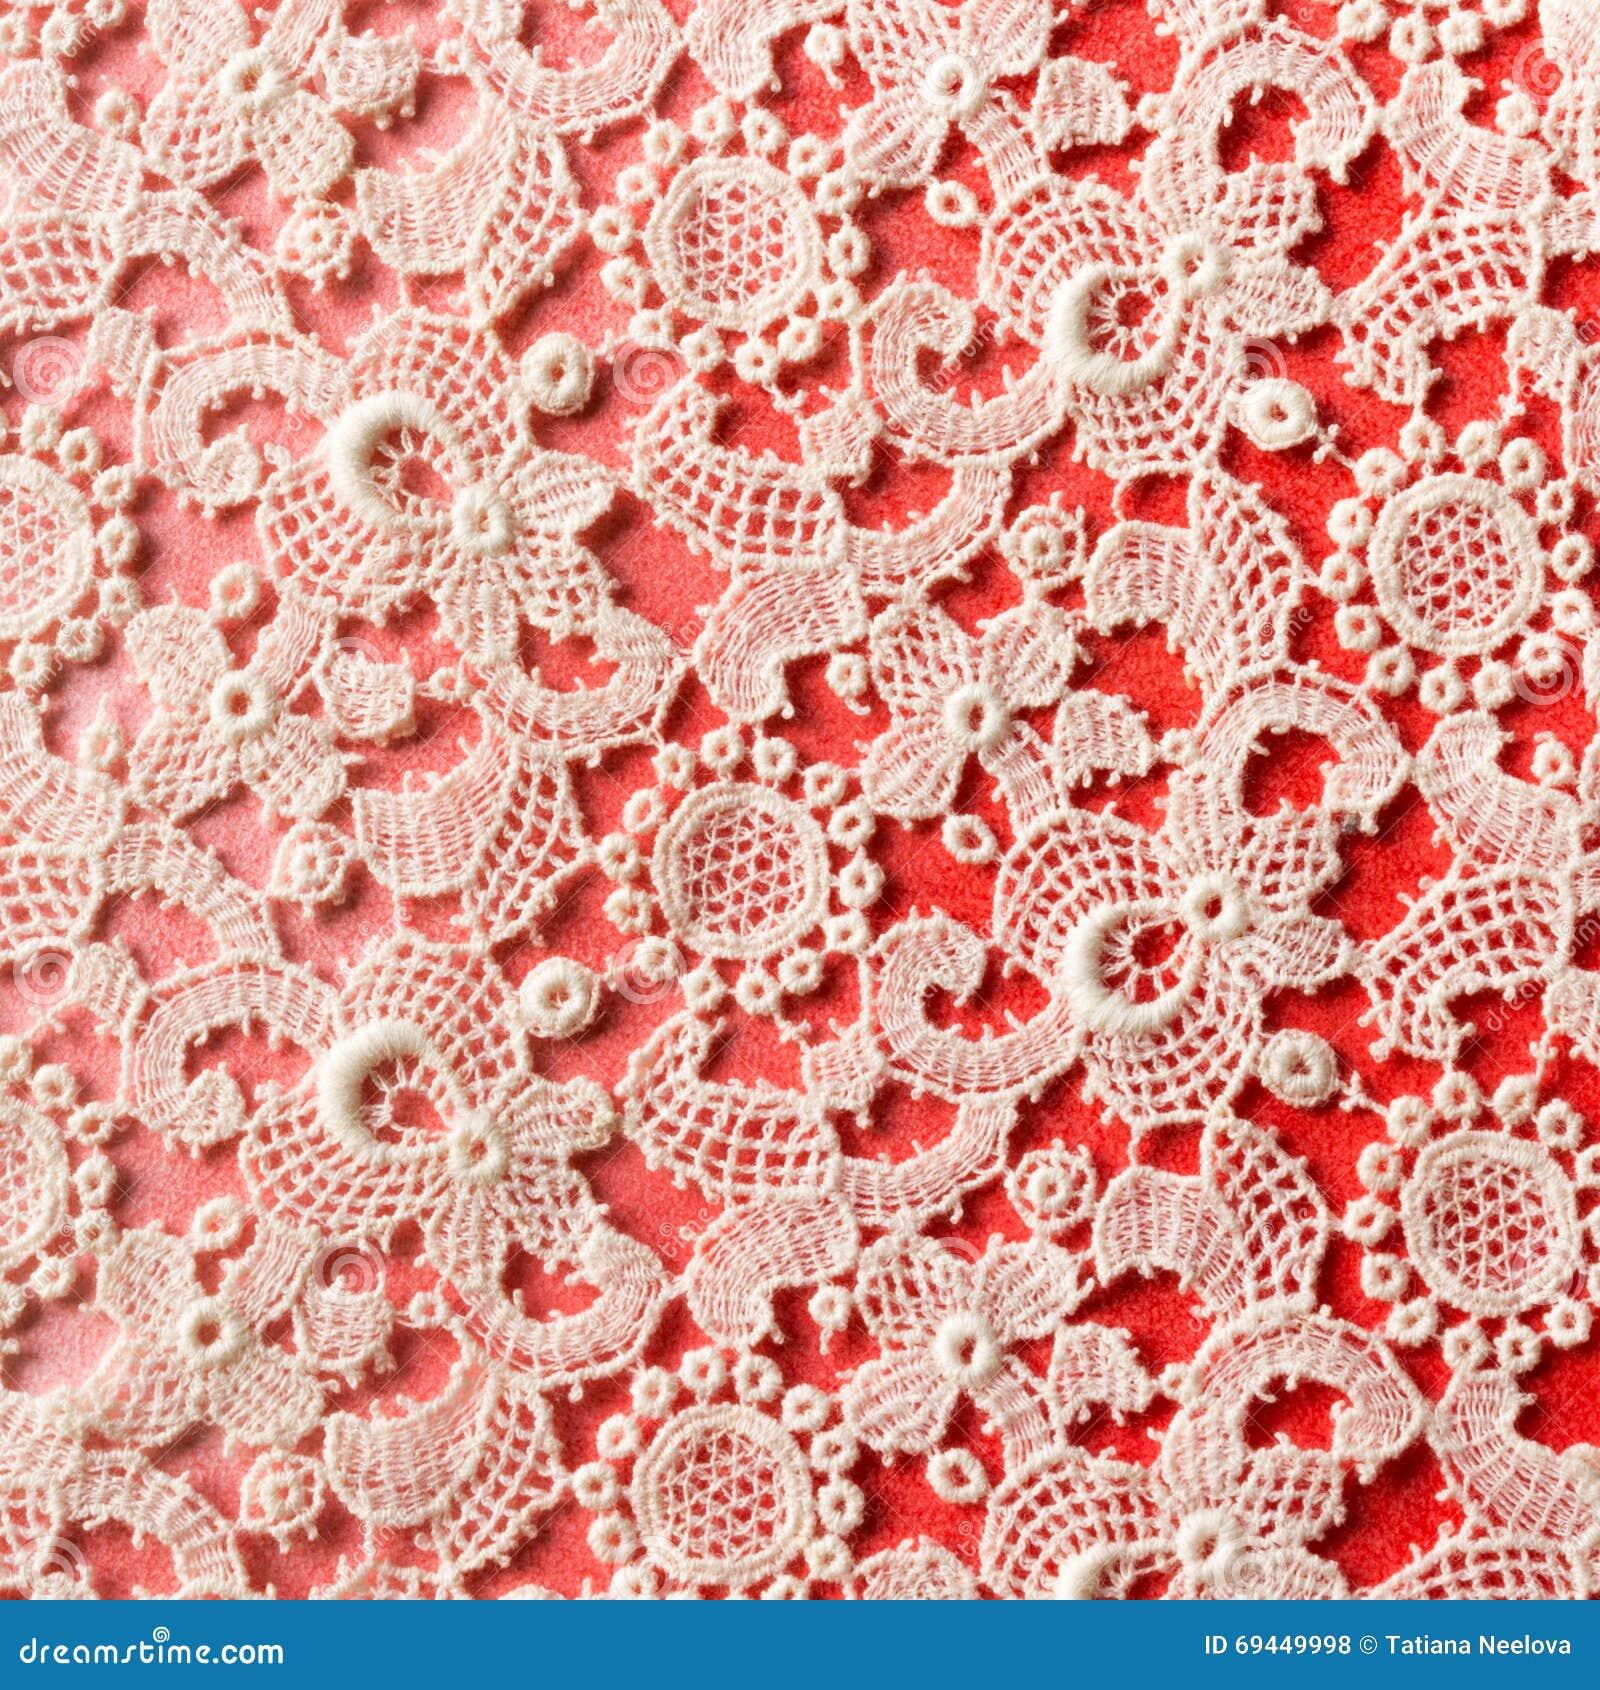 Crochet lace background